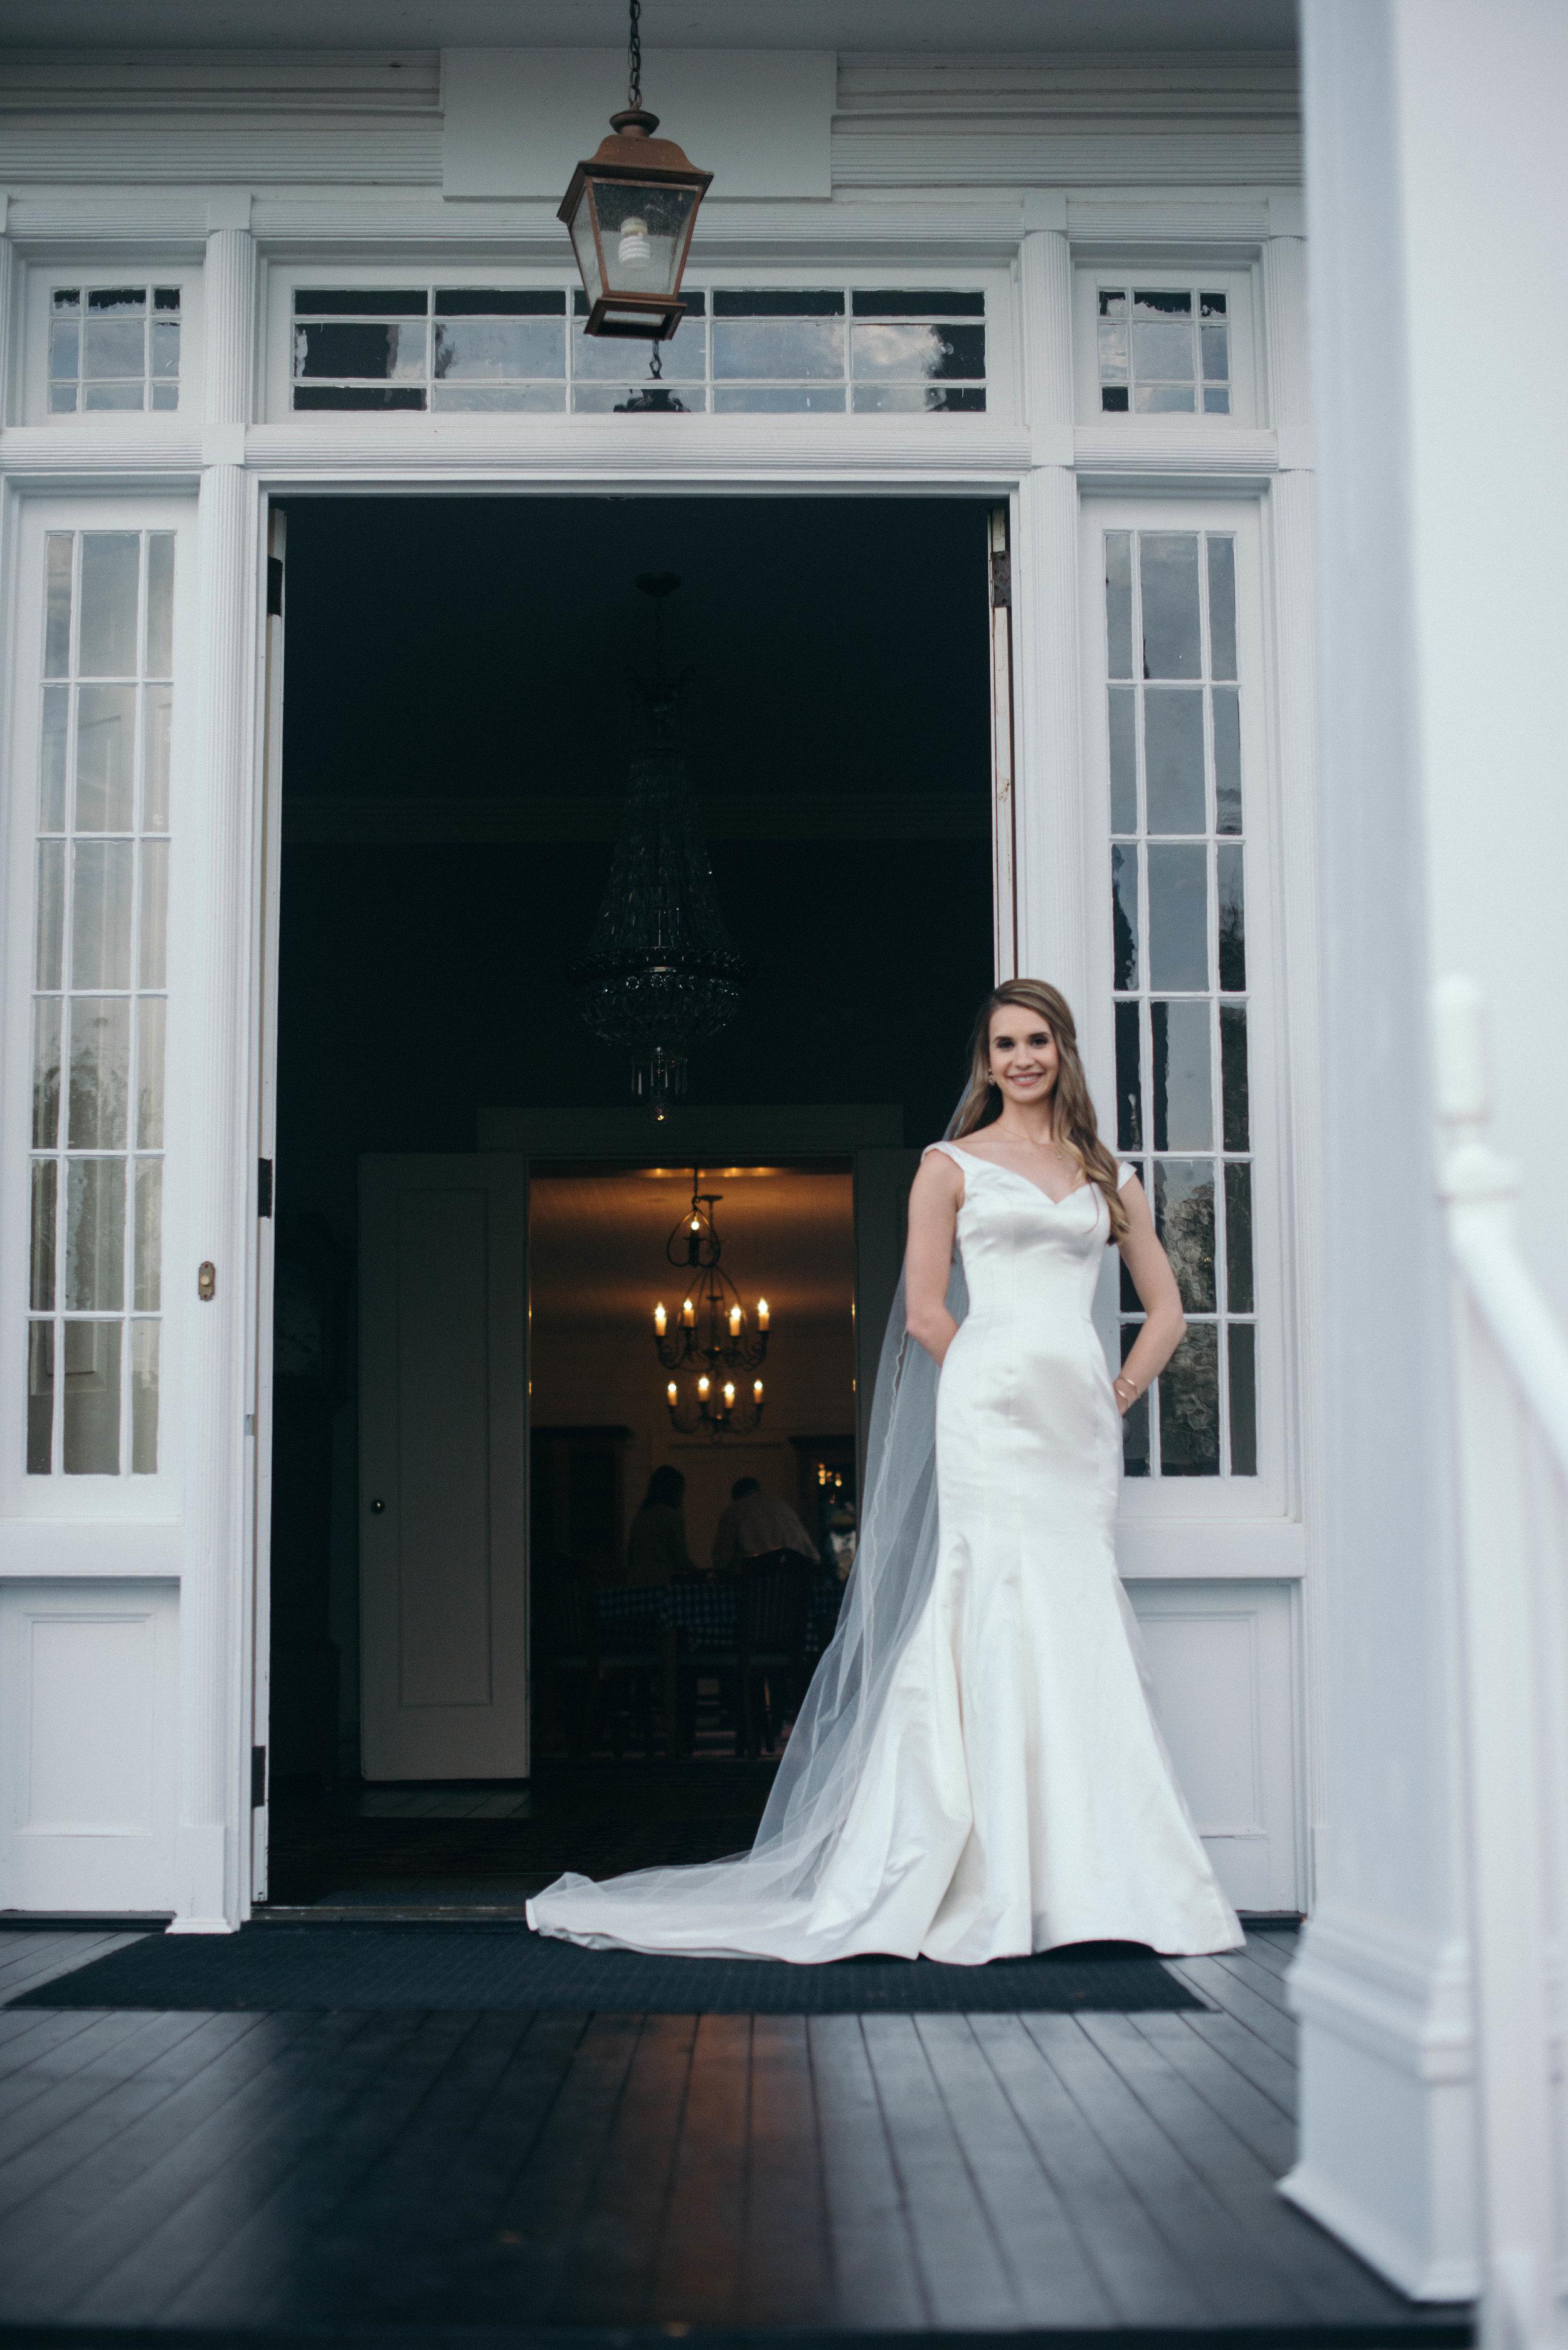 JuliaWilliams|Bridals|Color_MiraPhotographs-93.jpg